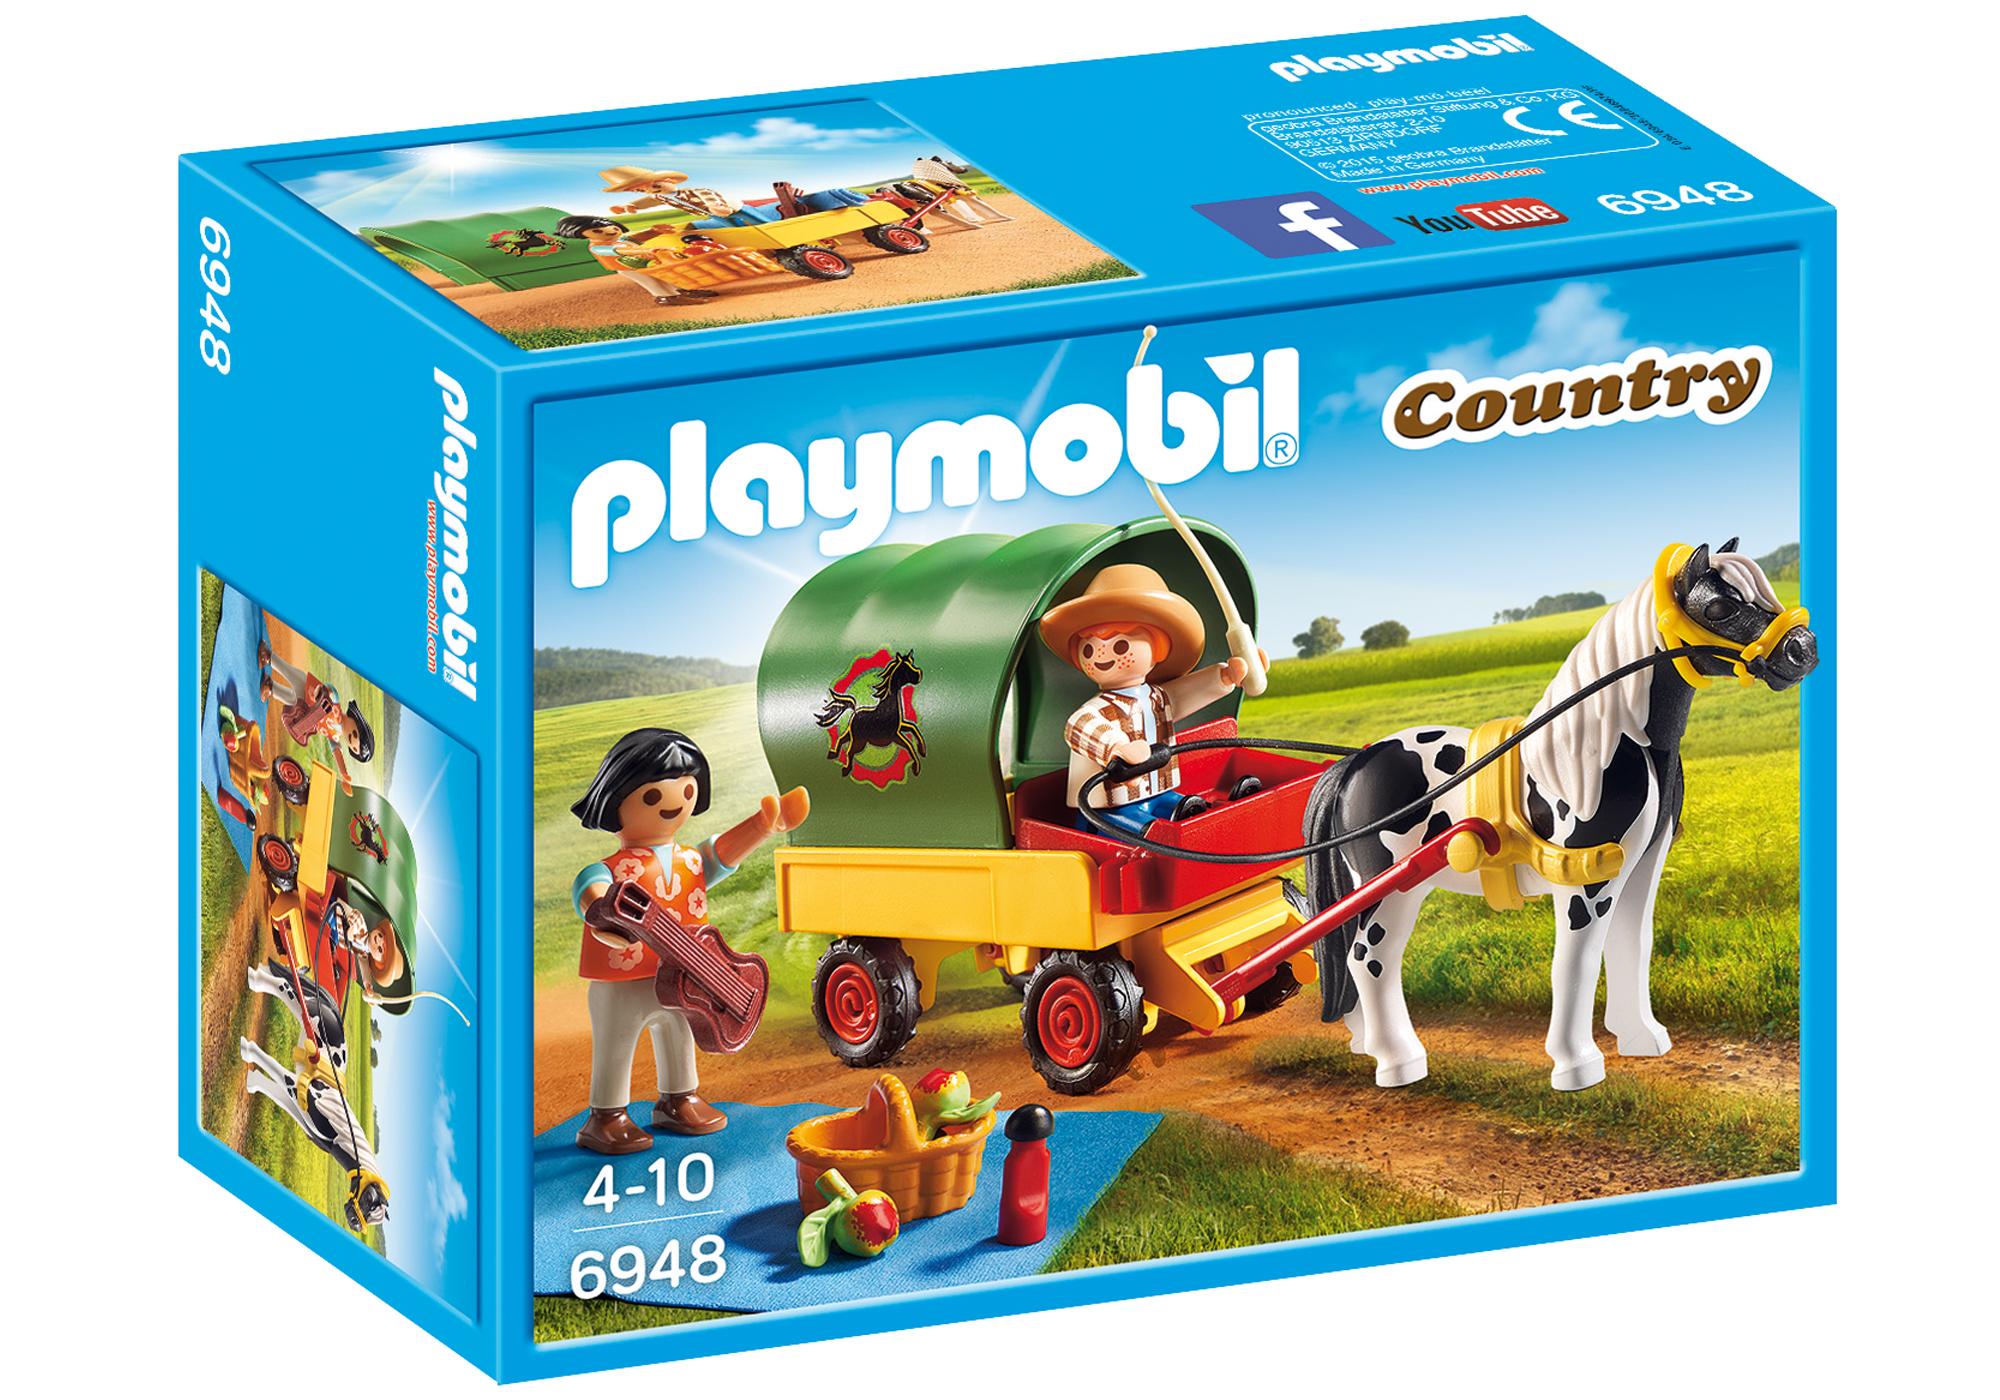 http://media.playmobil.com/i/playmobil/6948_product_box_front